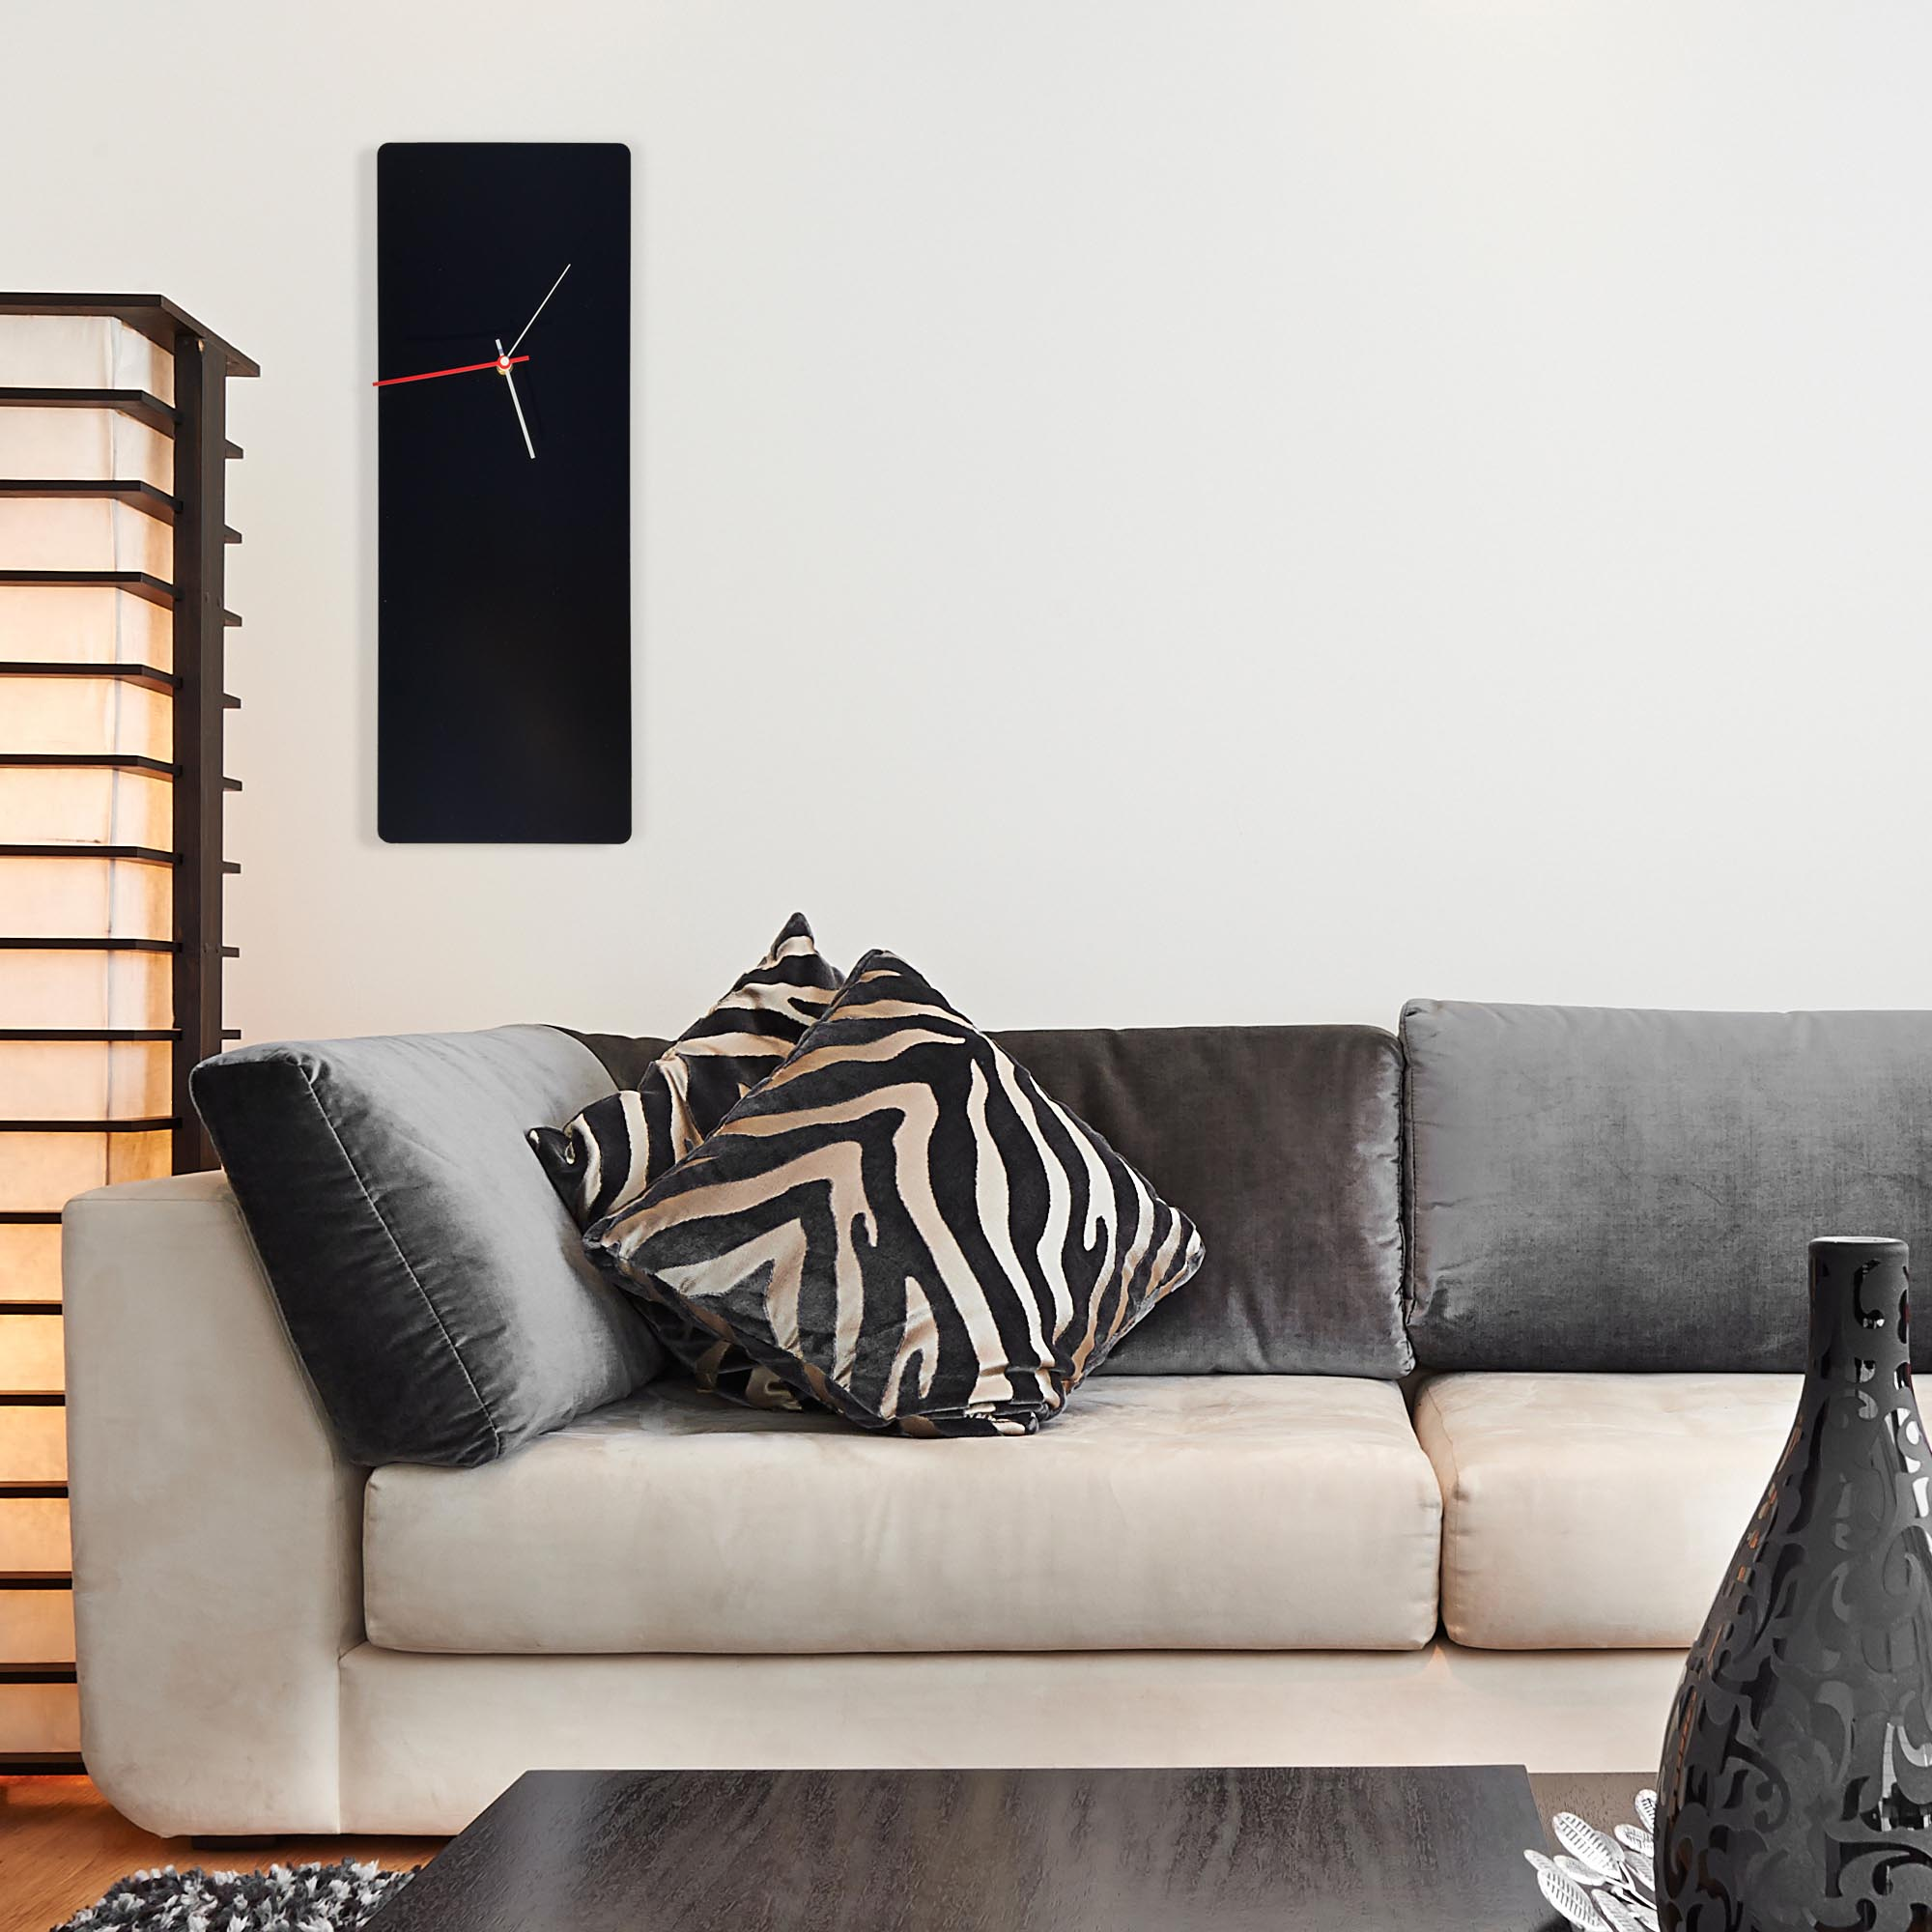 Metal Art Studio Minimalistic Decor Black Mod Clock Large 8.25in x 22in - Lifestyle View